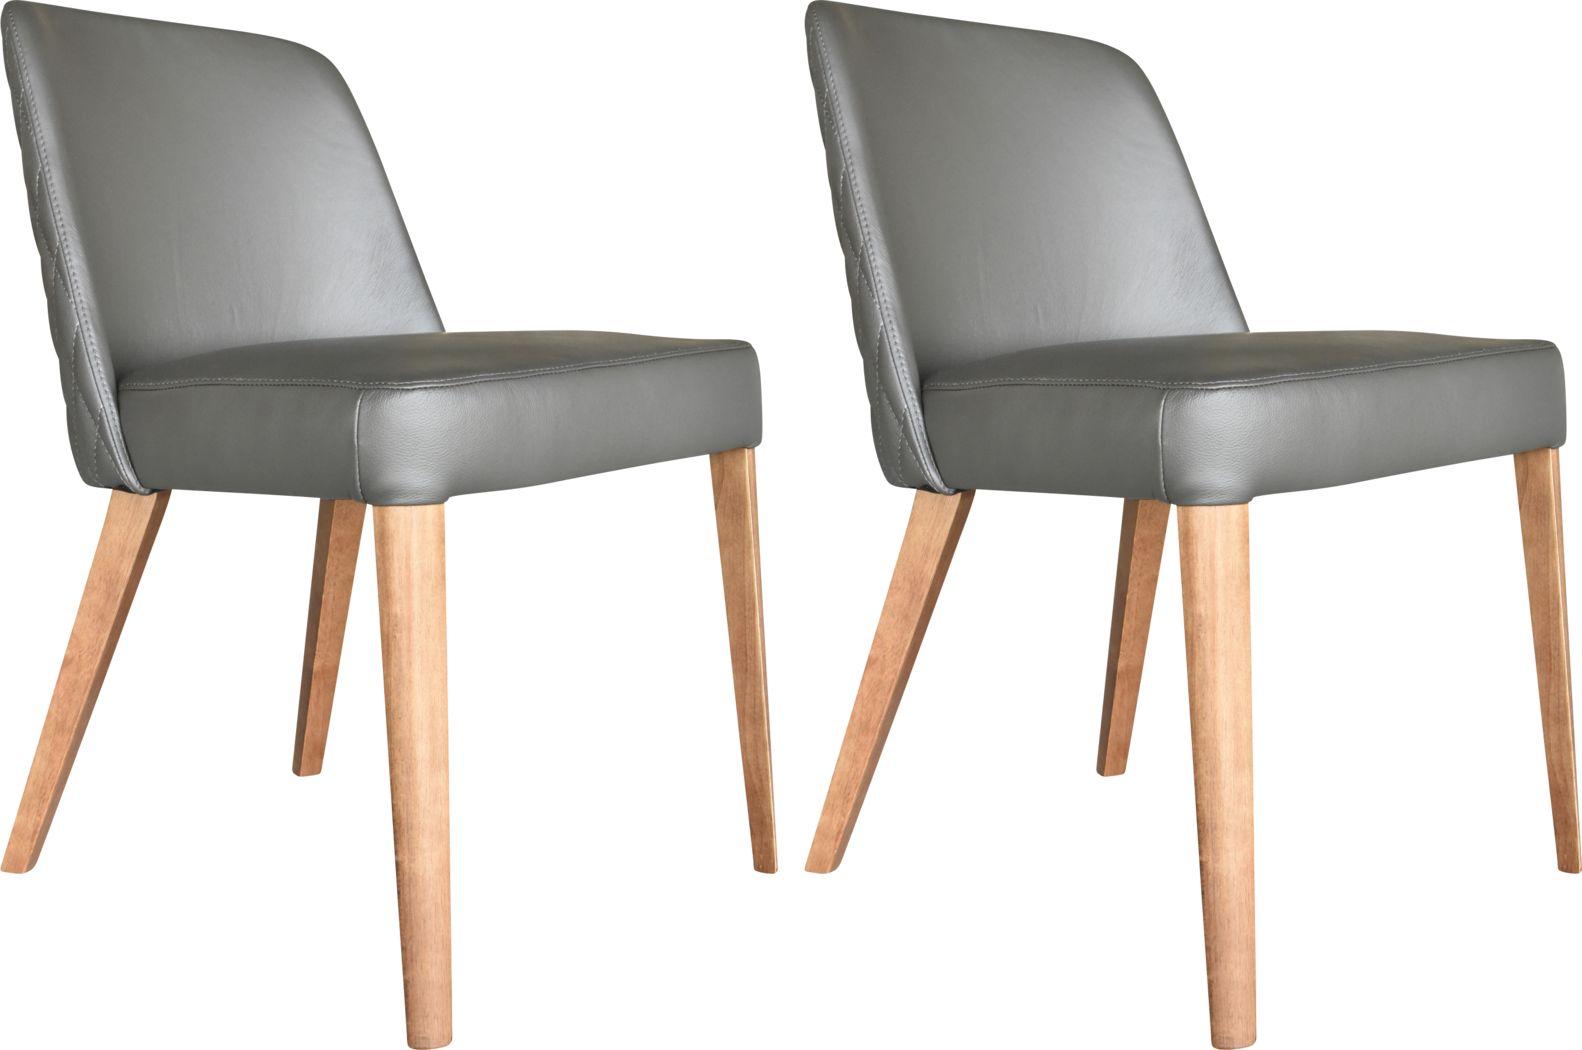 Mizpah Gray Dining Chair, Set of 2